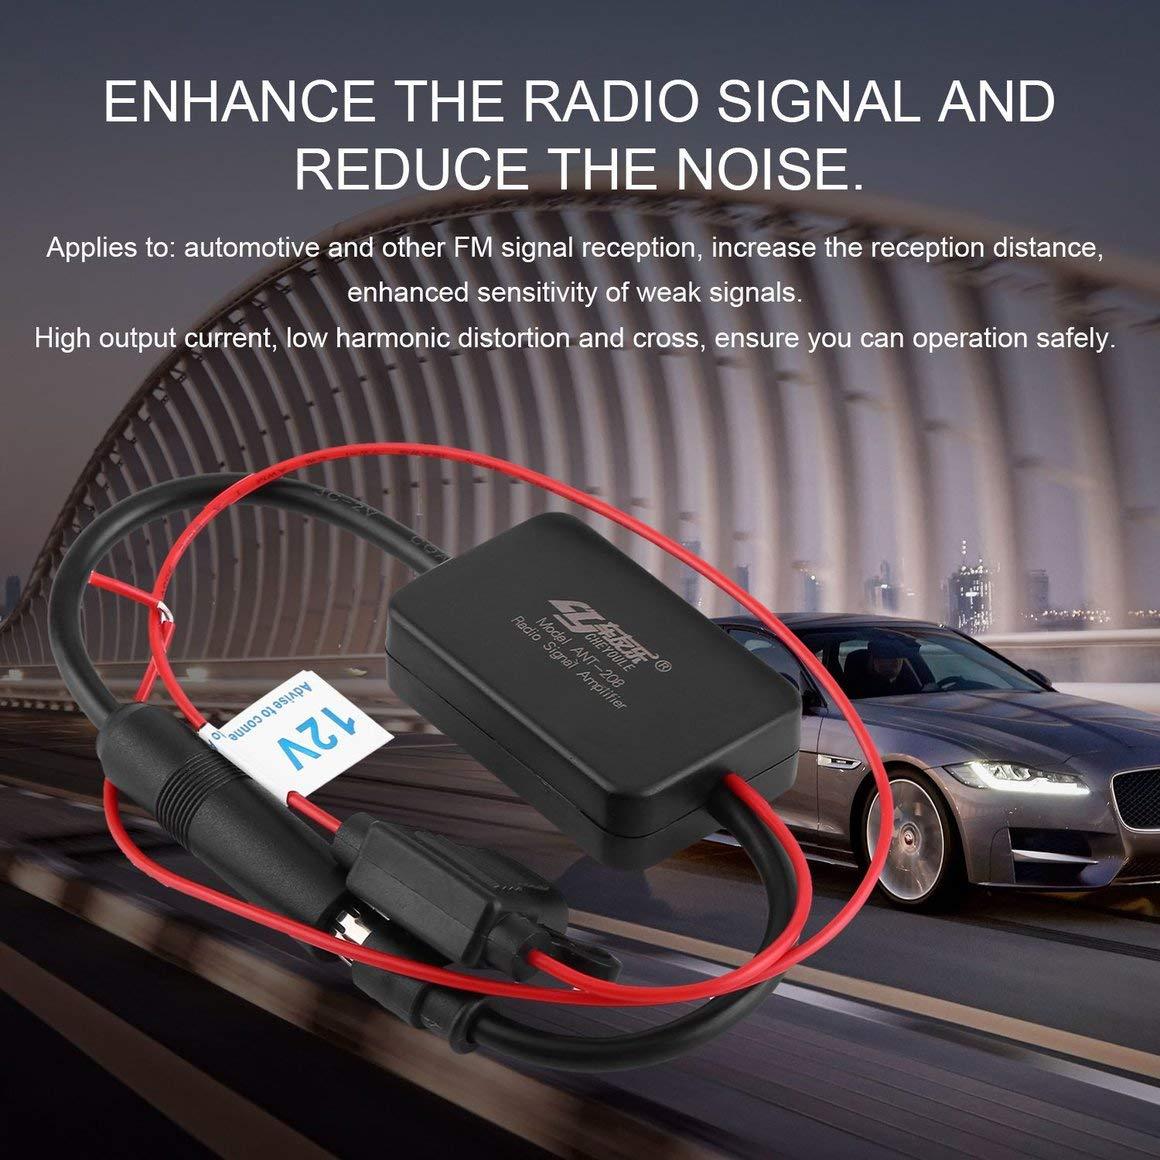 Funnyrunstore 12V Autom/óvil Amplificador de Se/ñal de Radio de Autom/óvil ANT-208 Veh/ículos Autom/óviles Aumento de Antena de FM para Mejorar Se/ñales Negro